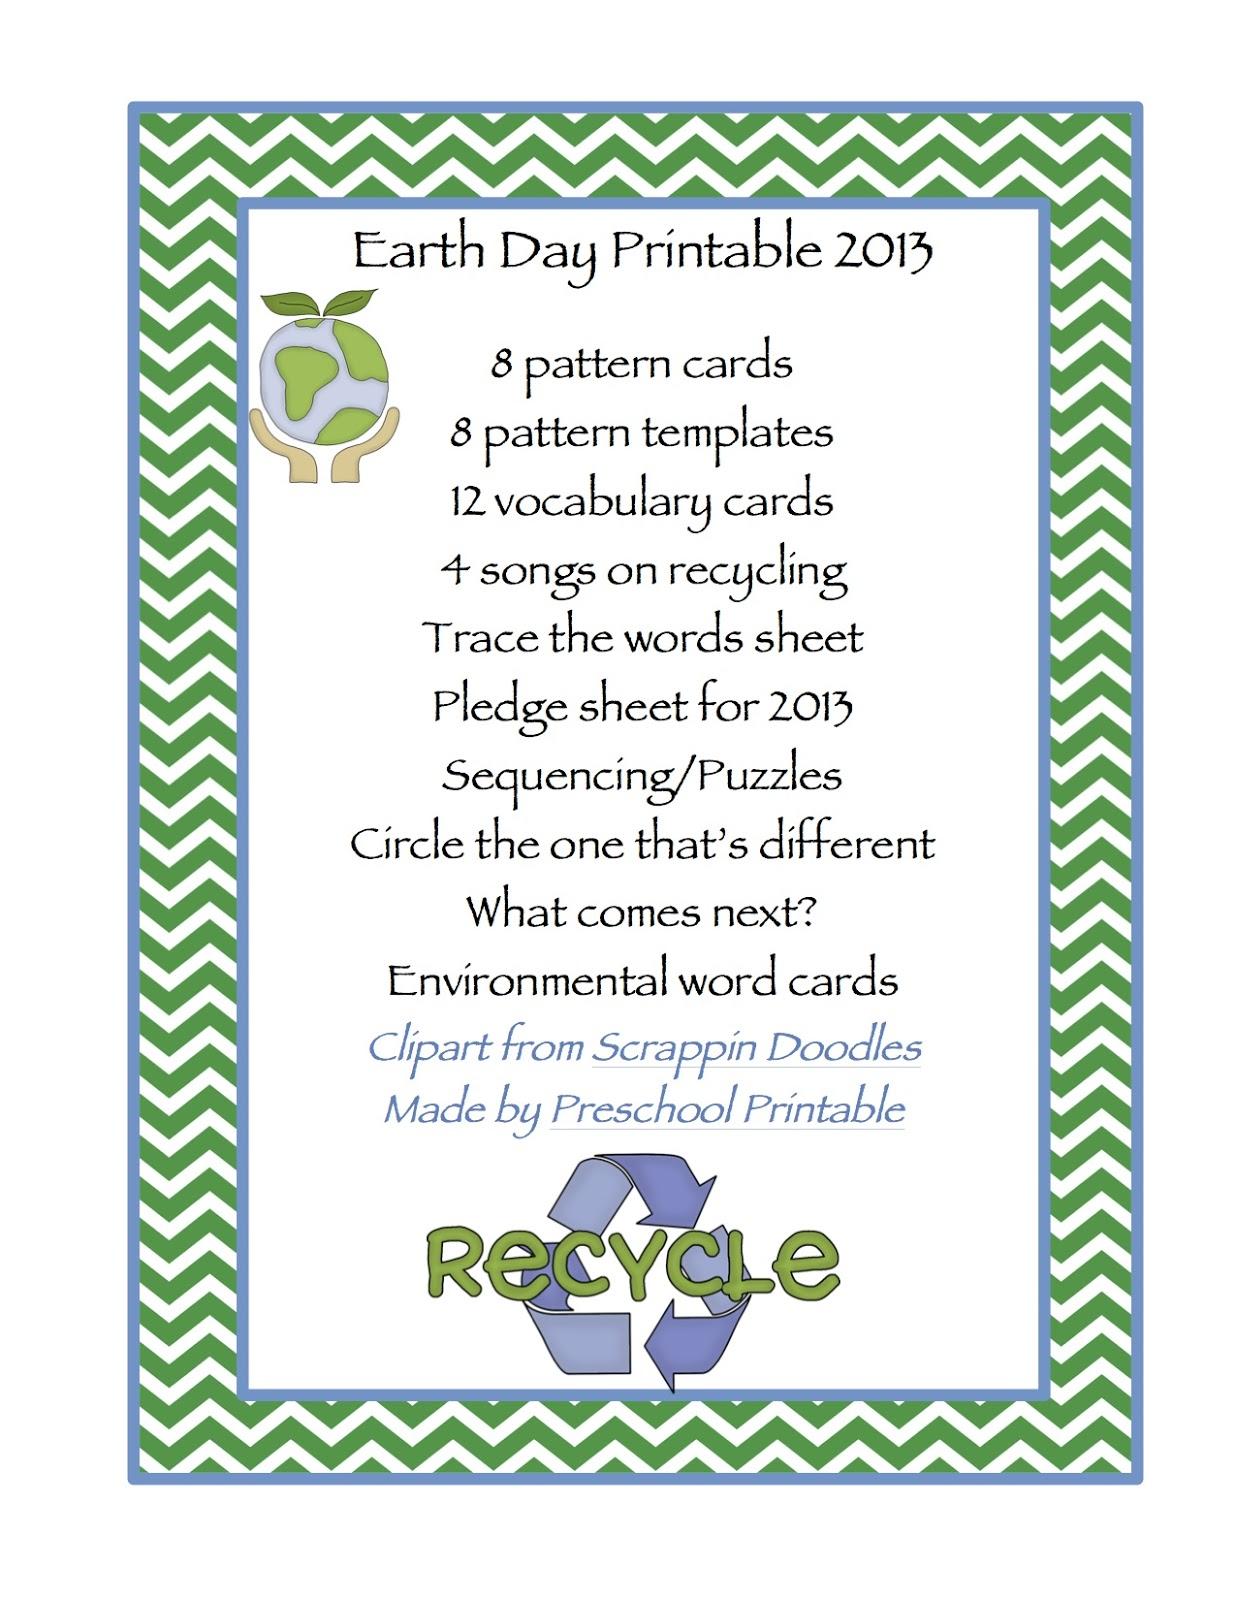 Earth day printable 2013 preschool printables httpteachersnotebookproductpreschoolprintableearth day printable 2013 robcynllc Images